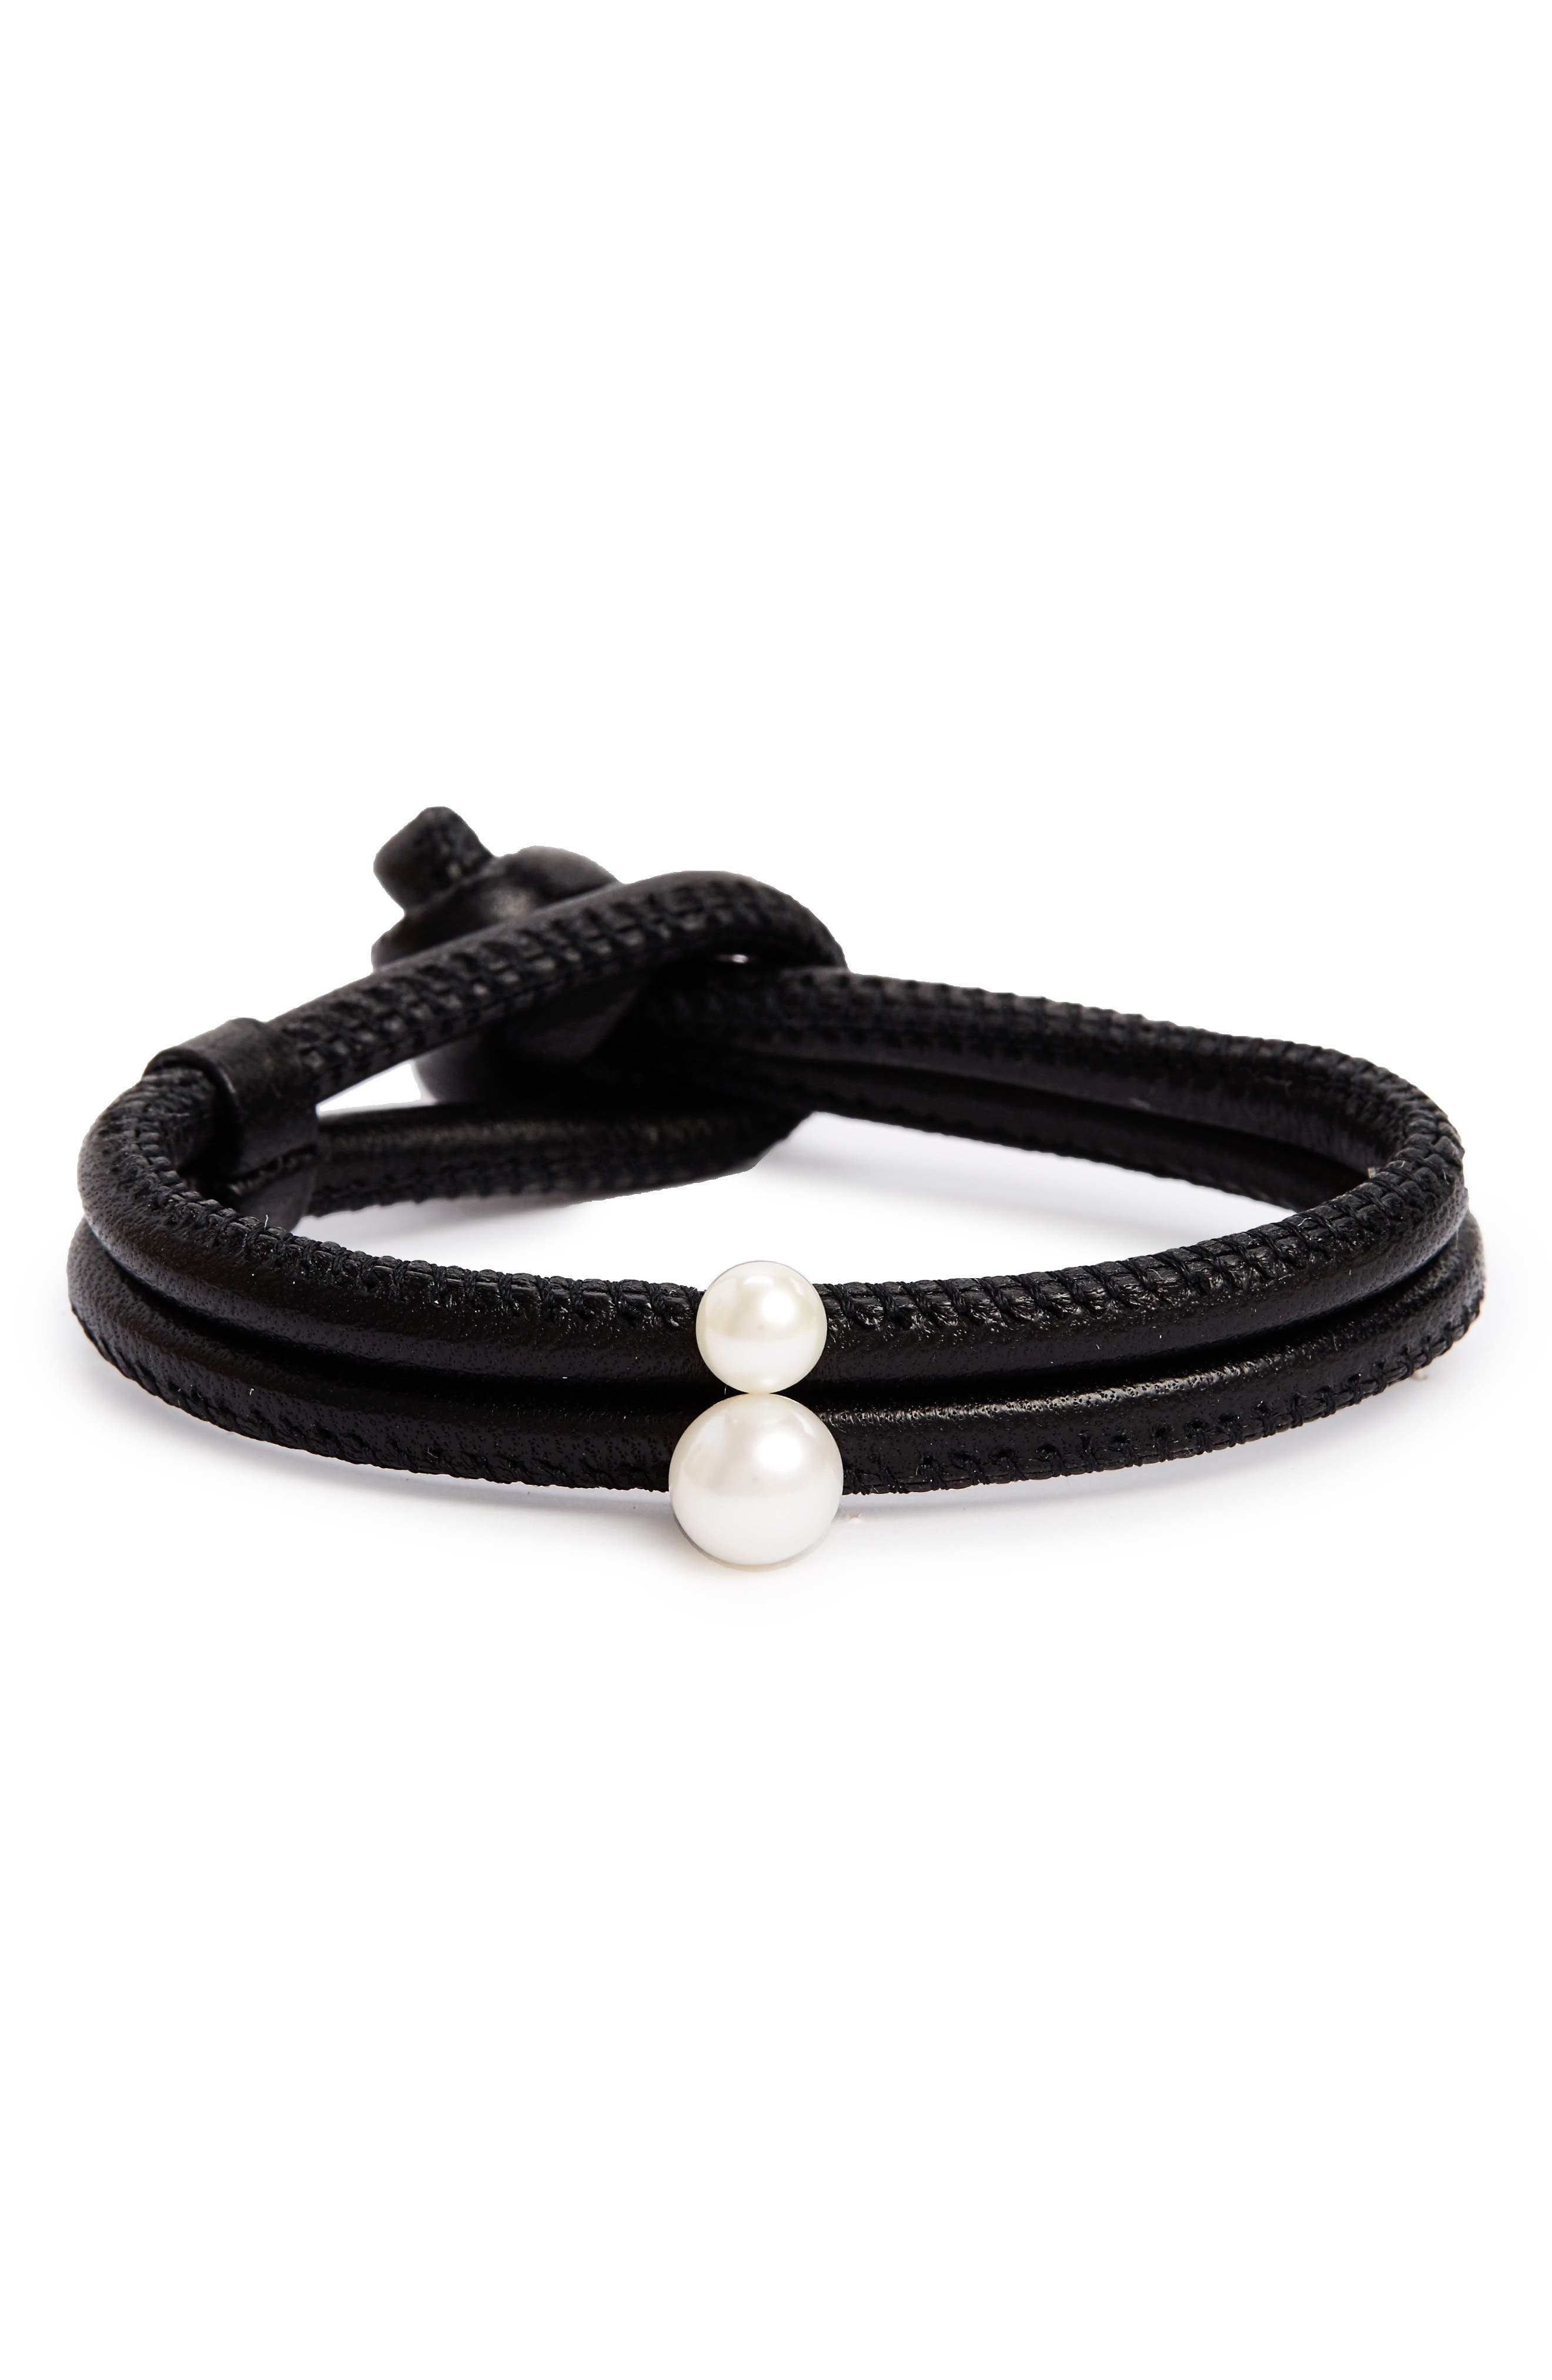 Main Image - Mizuki Leather & Akoya Pearl Bracelet